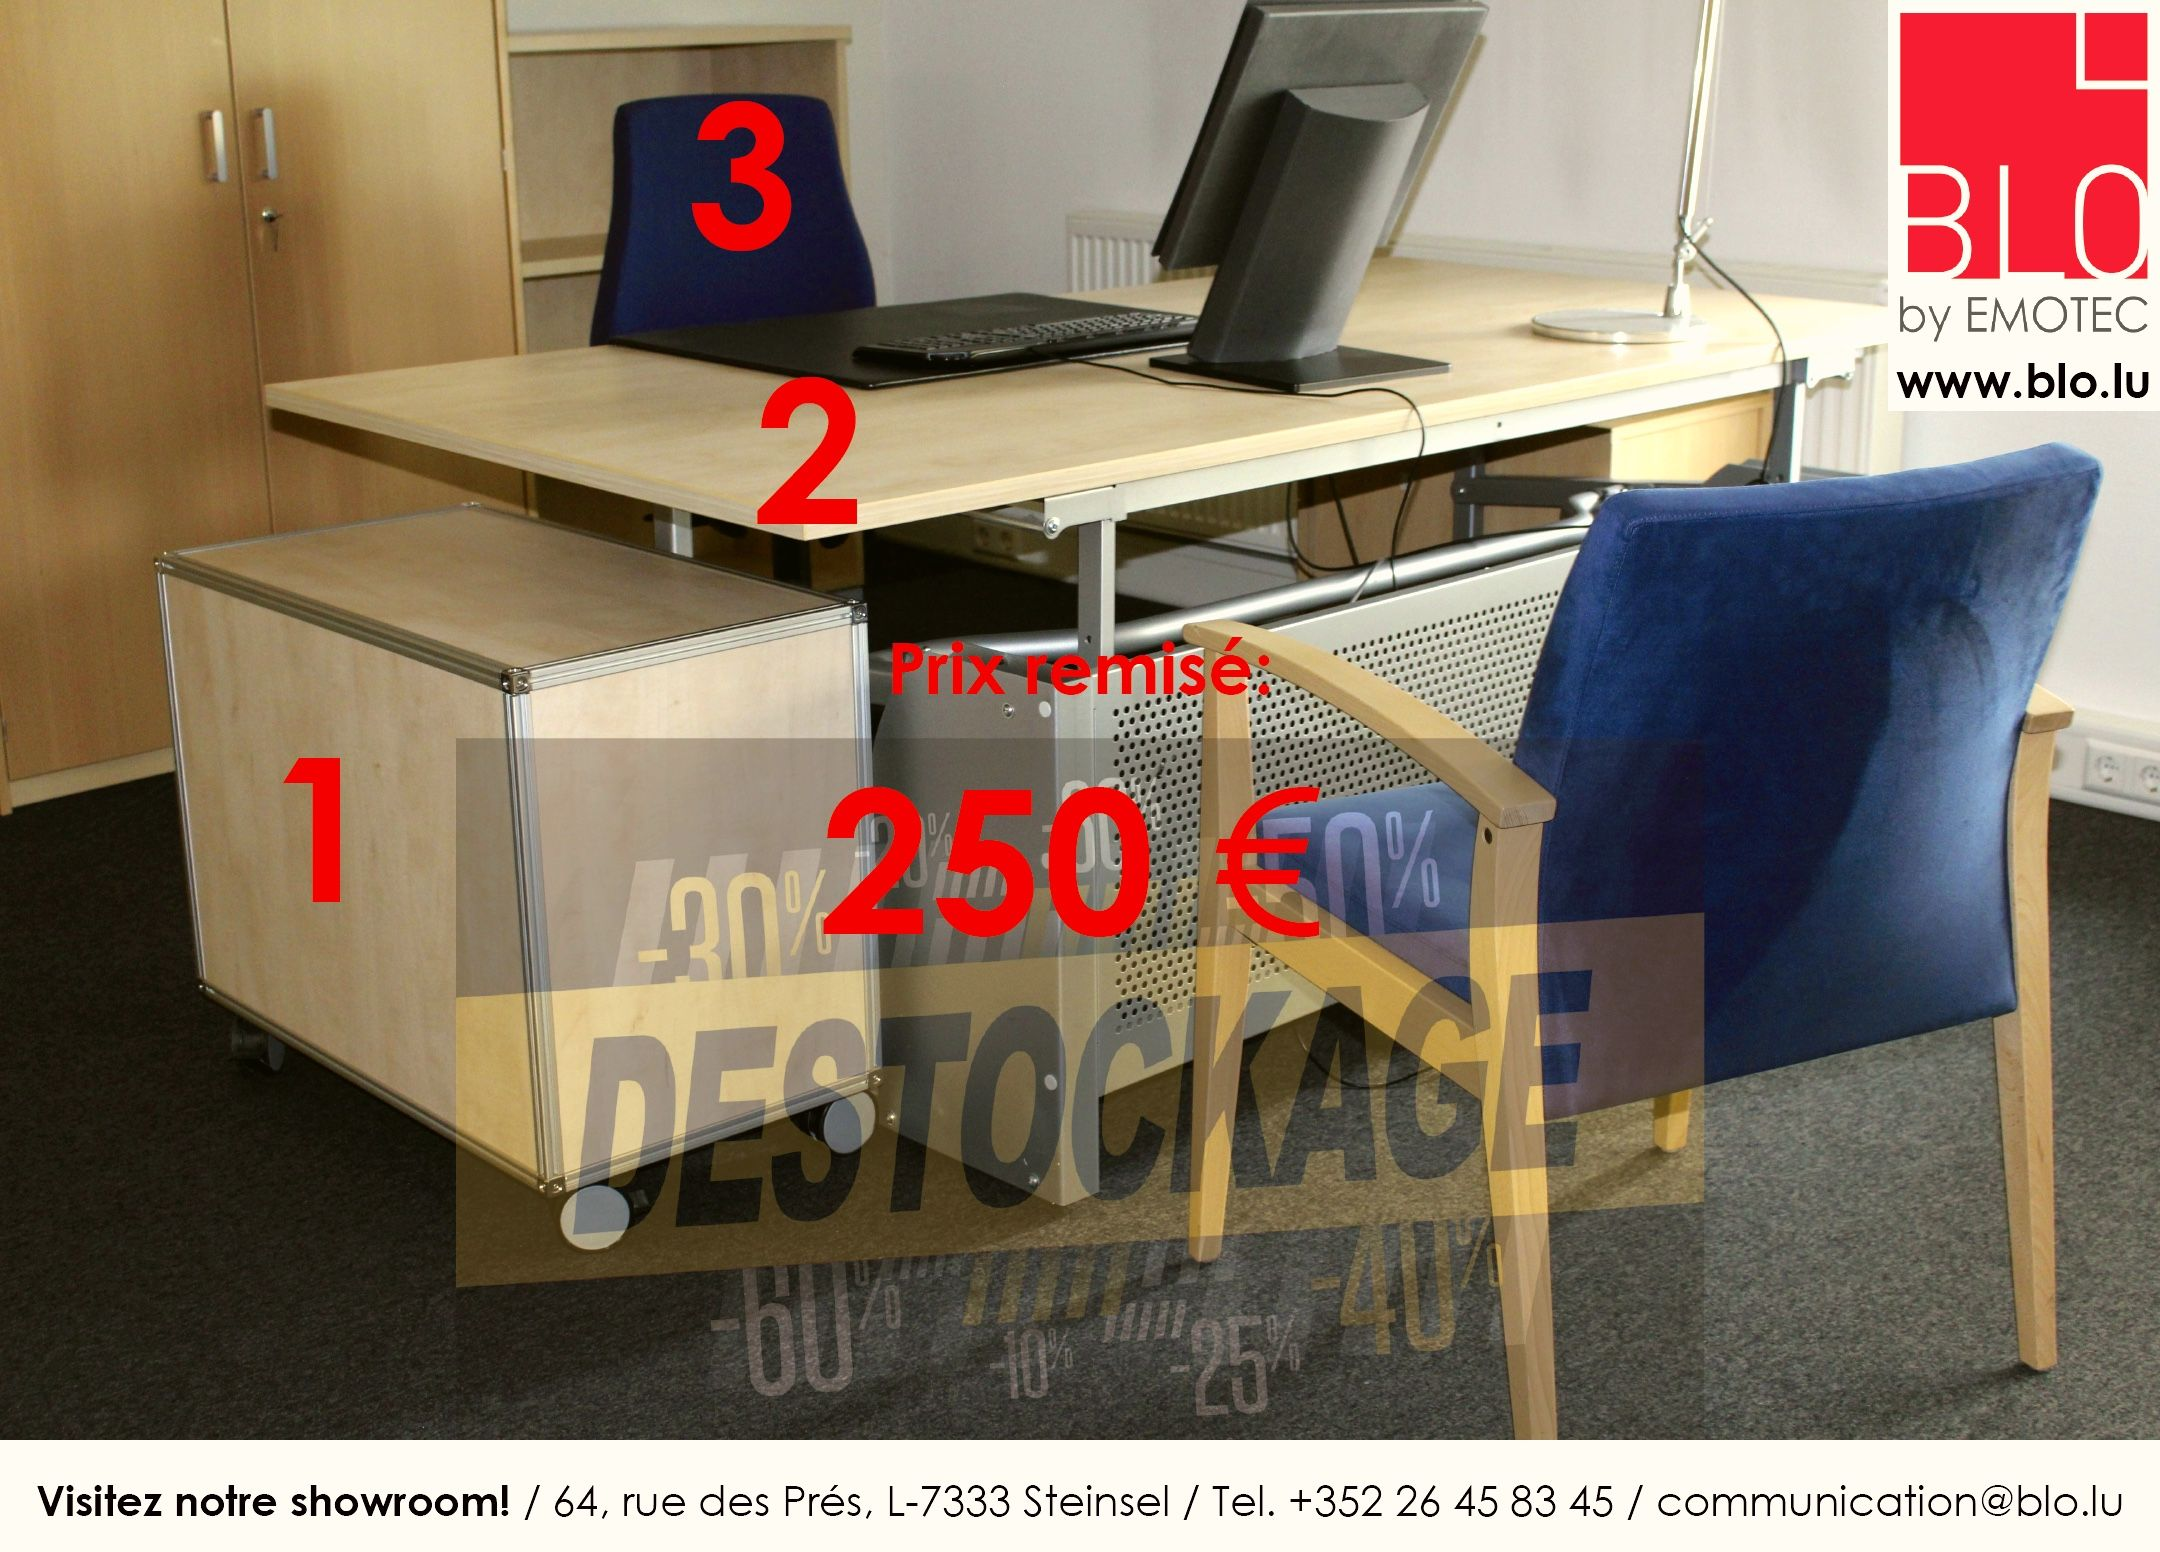 Vente A Emporter Bureau Furniture Officedecoration Decor Bureaudesign Bureauchair Officechair Coworking O Mobilier Bureau Chaise Bureau Bureau Design